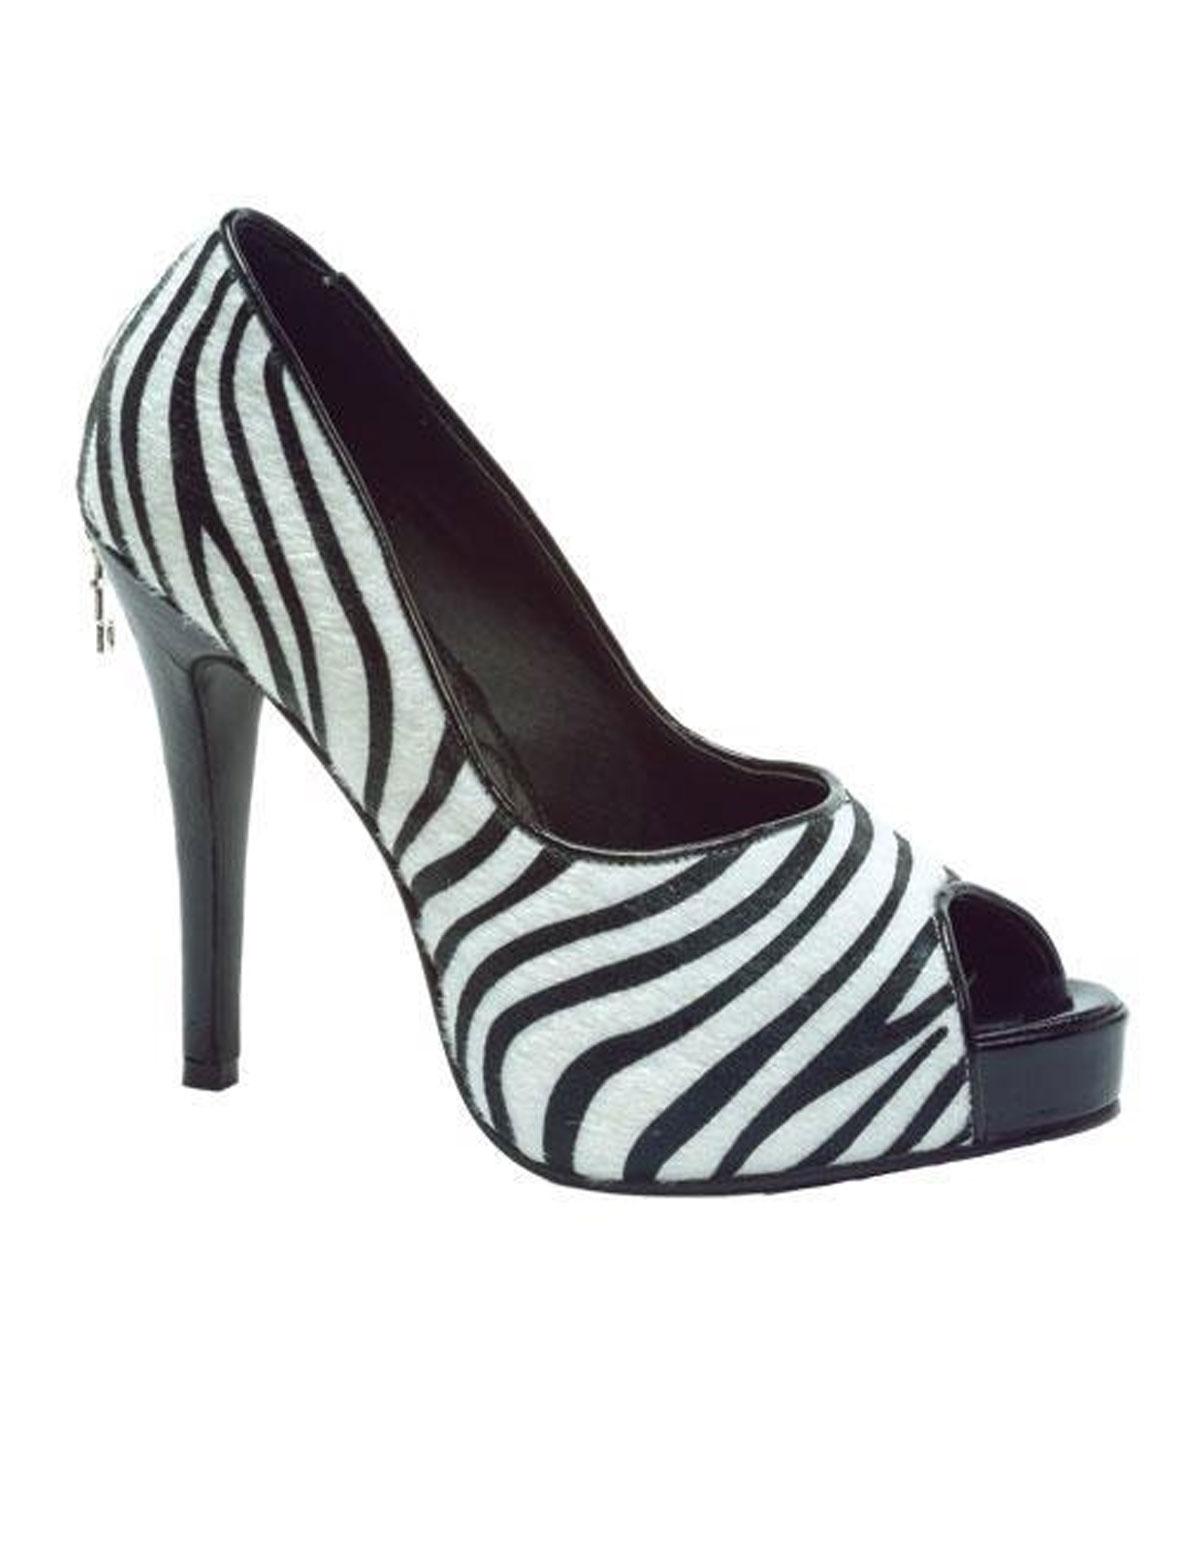 Harlow Shoe